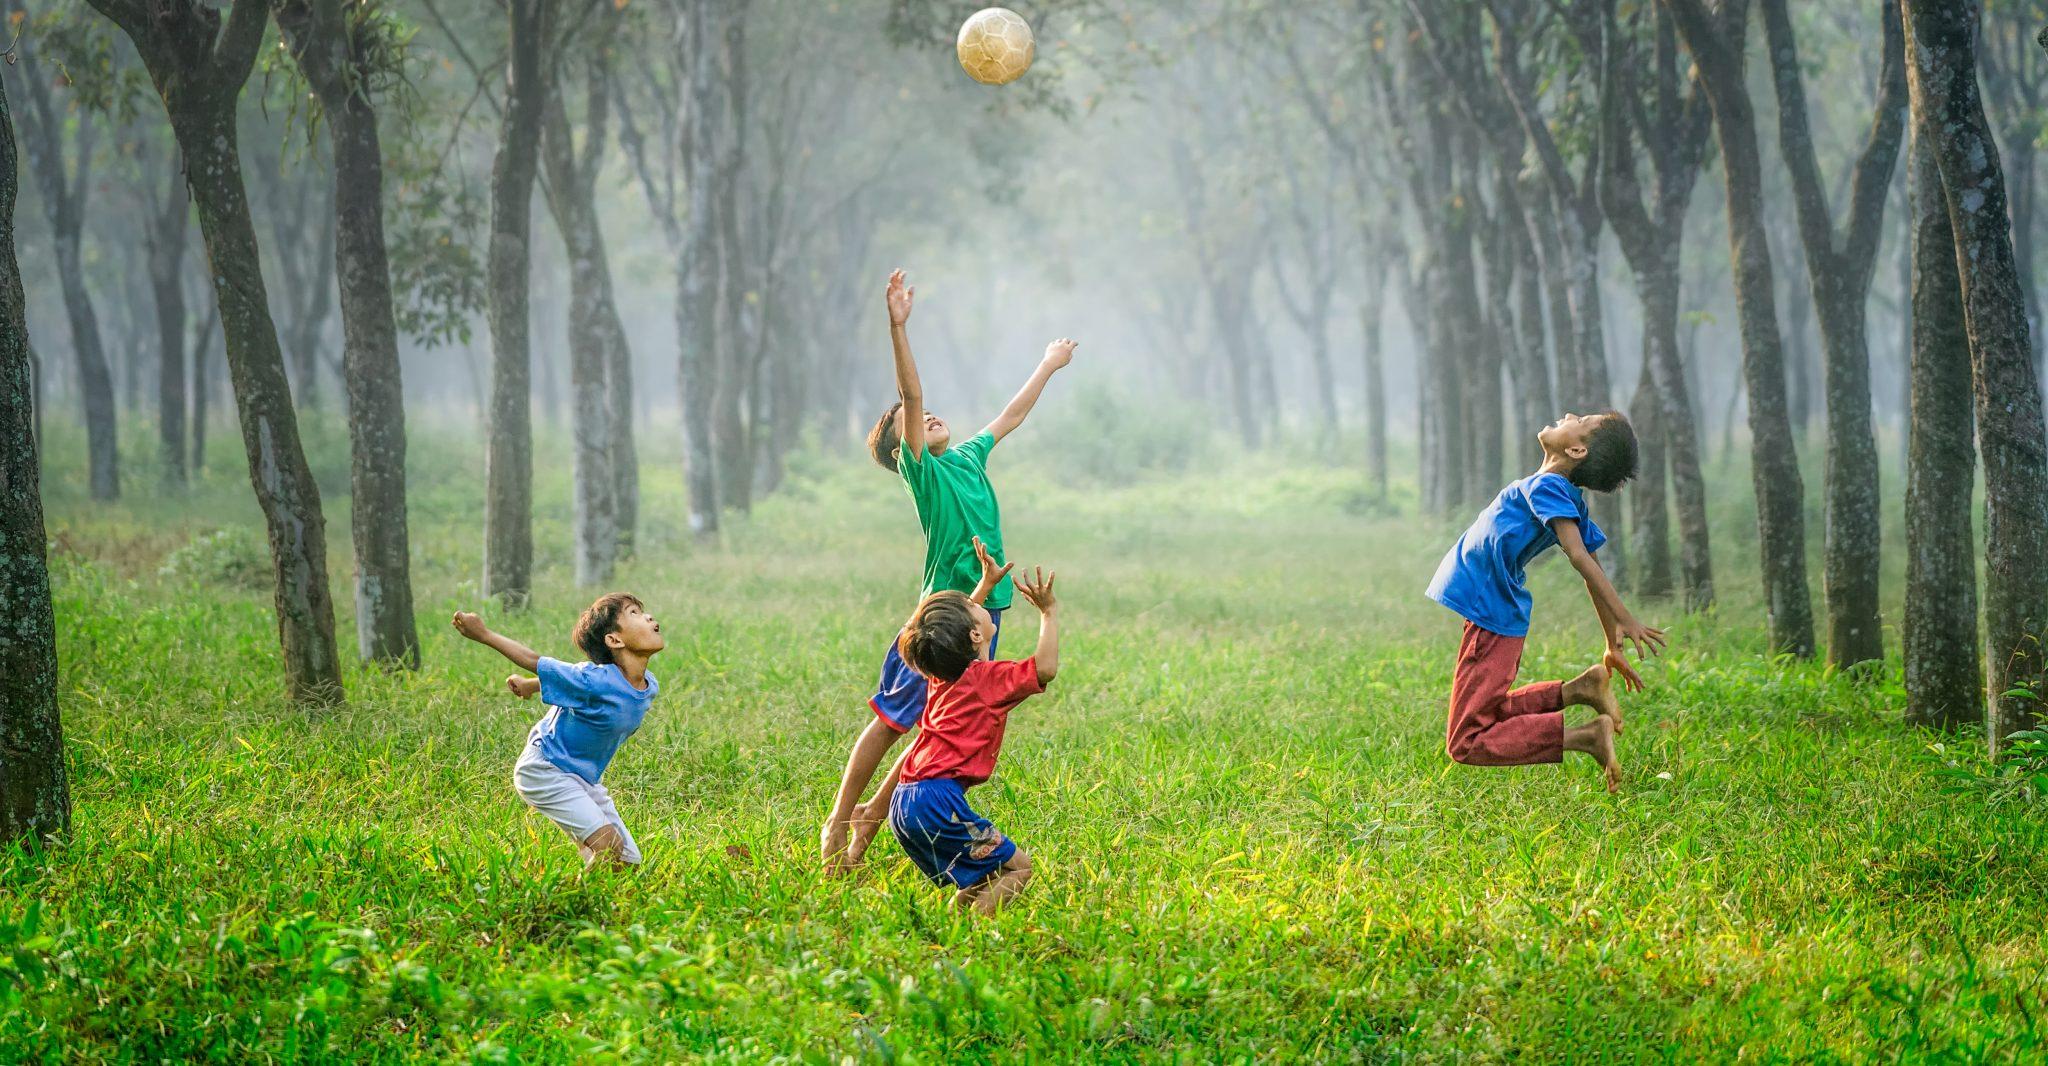 Kinder - Photo by Robert Collins / Unsplash